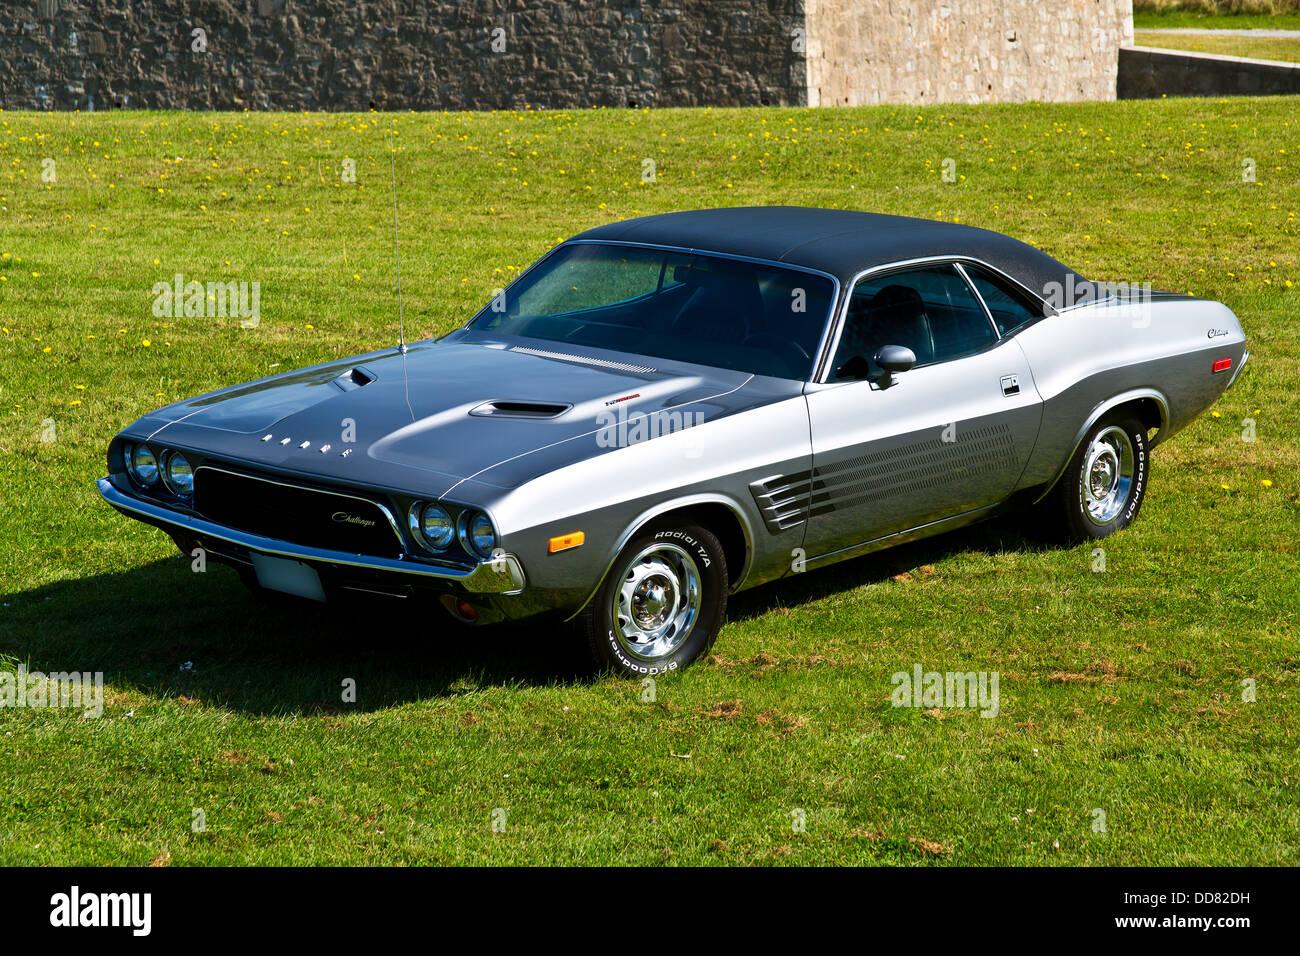 1973 Dodge Challenger on grass Stock Photo